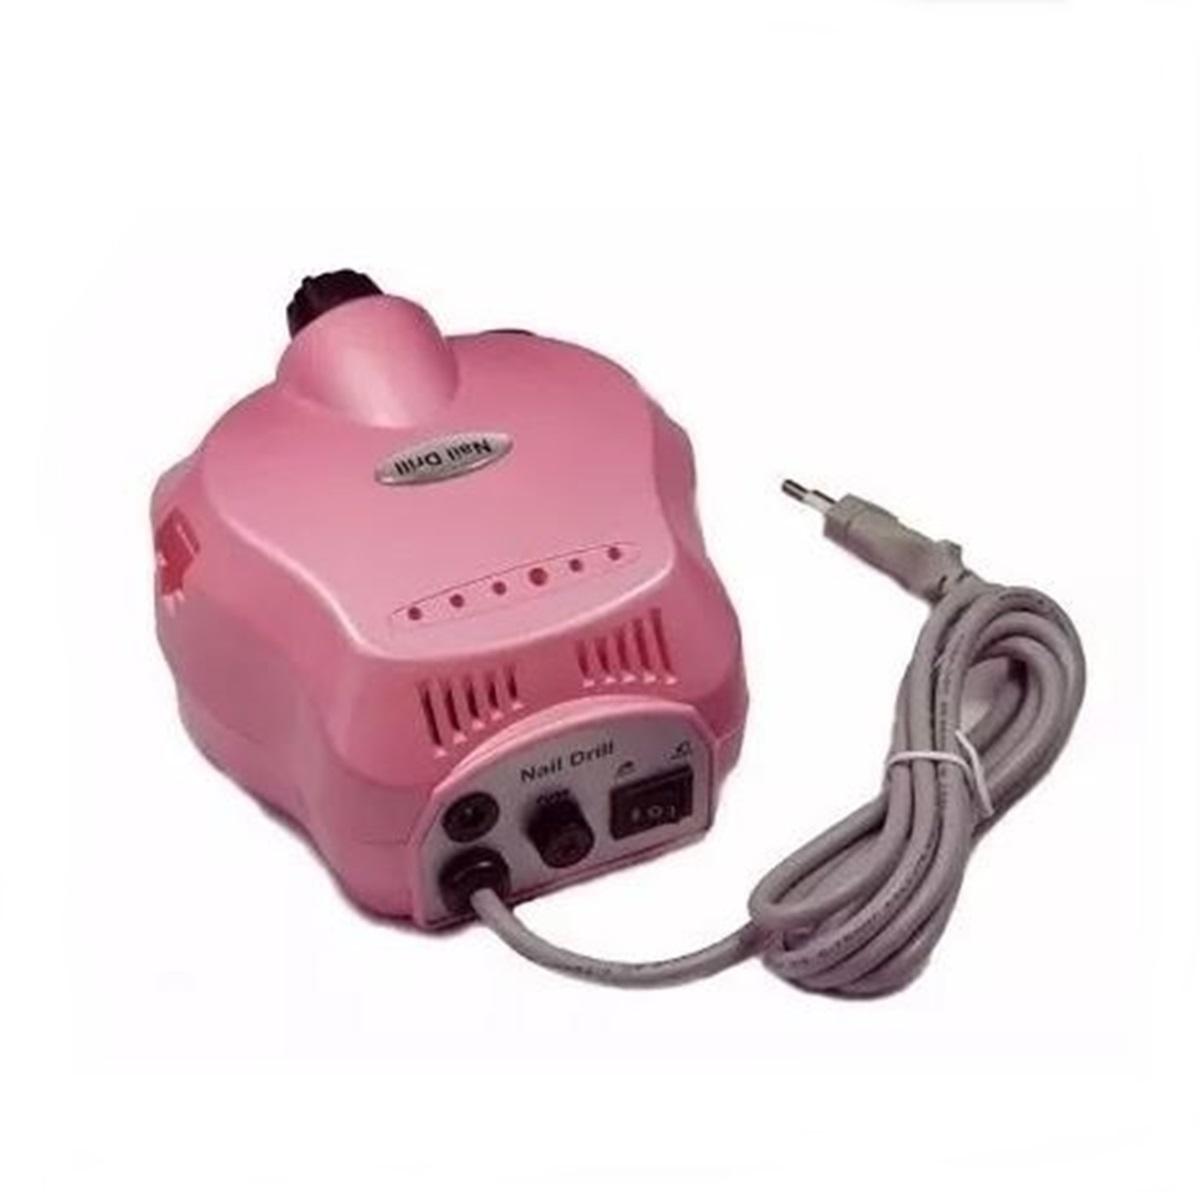 Lixadeira Motor Elétrica Unha Profissional Nail Drill Rosa 30000 RPM Bivolt